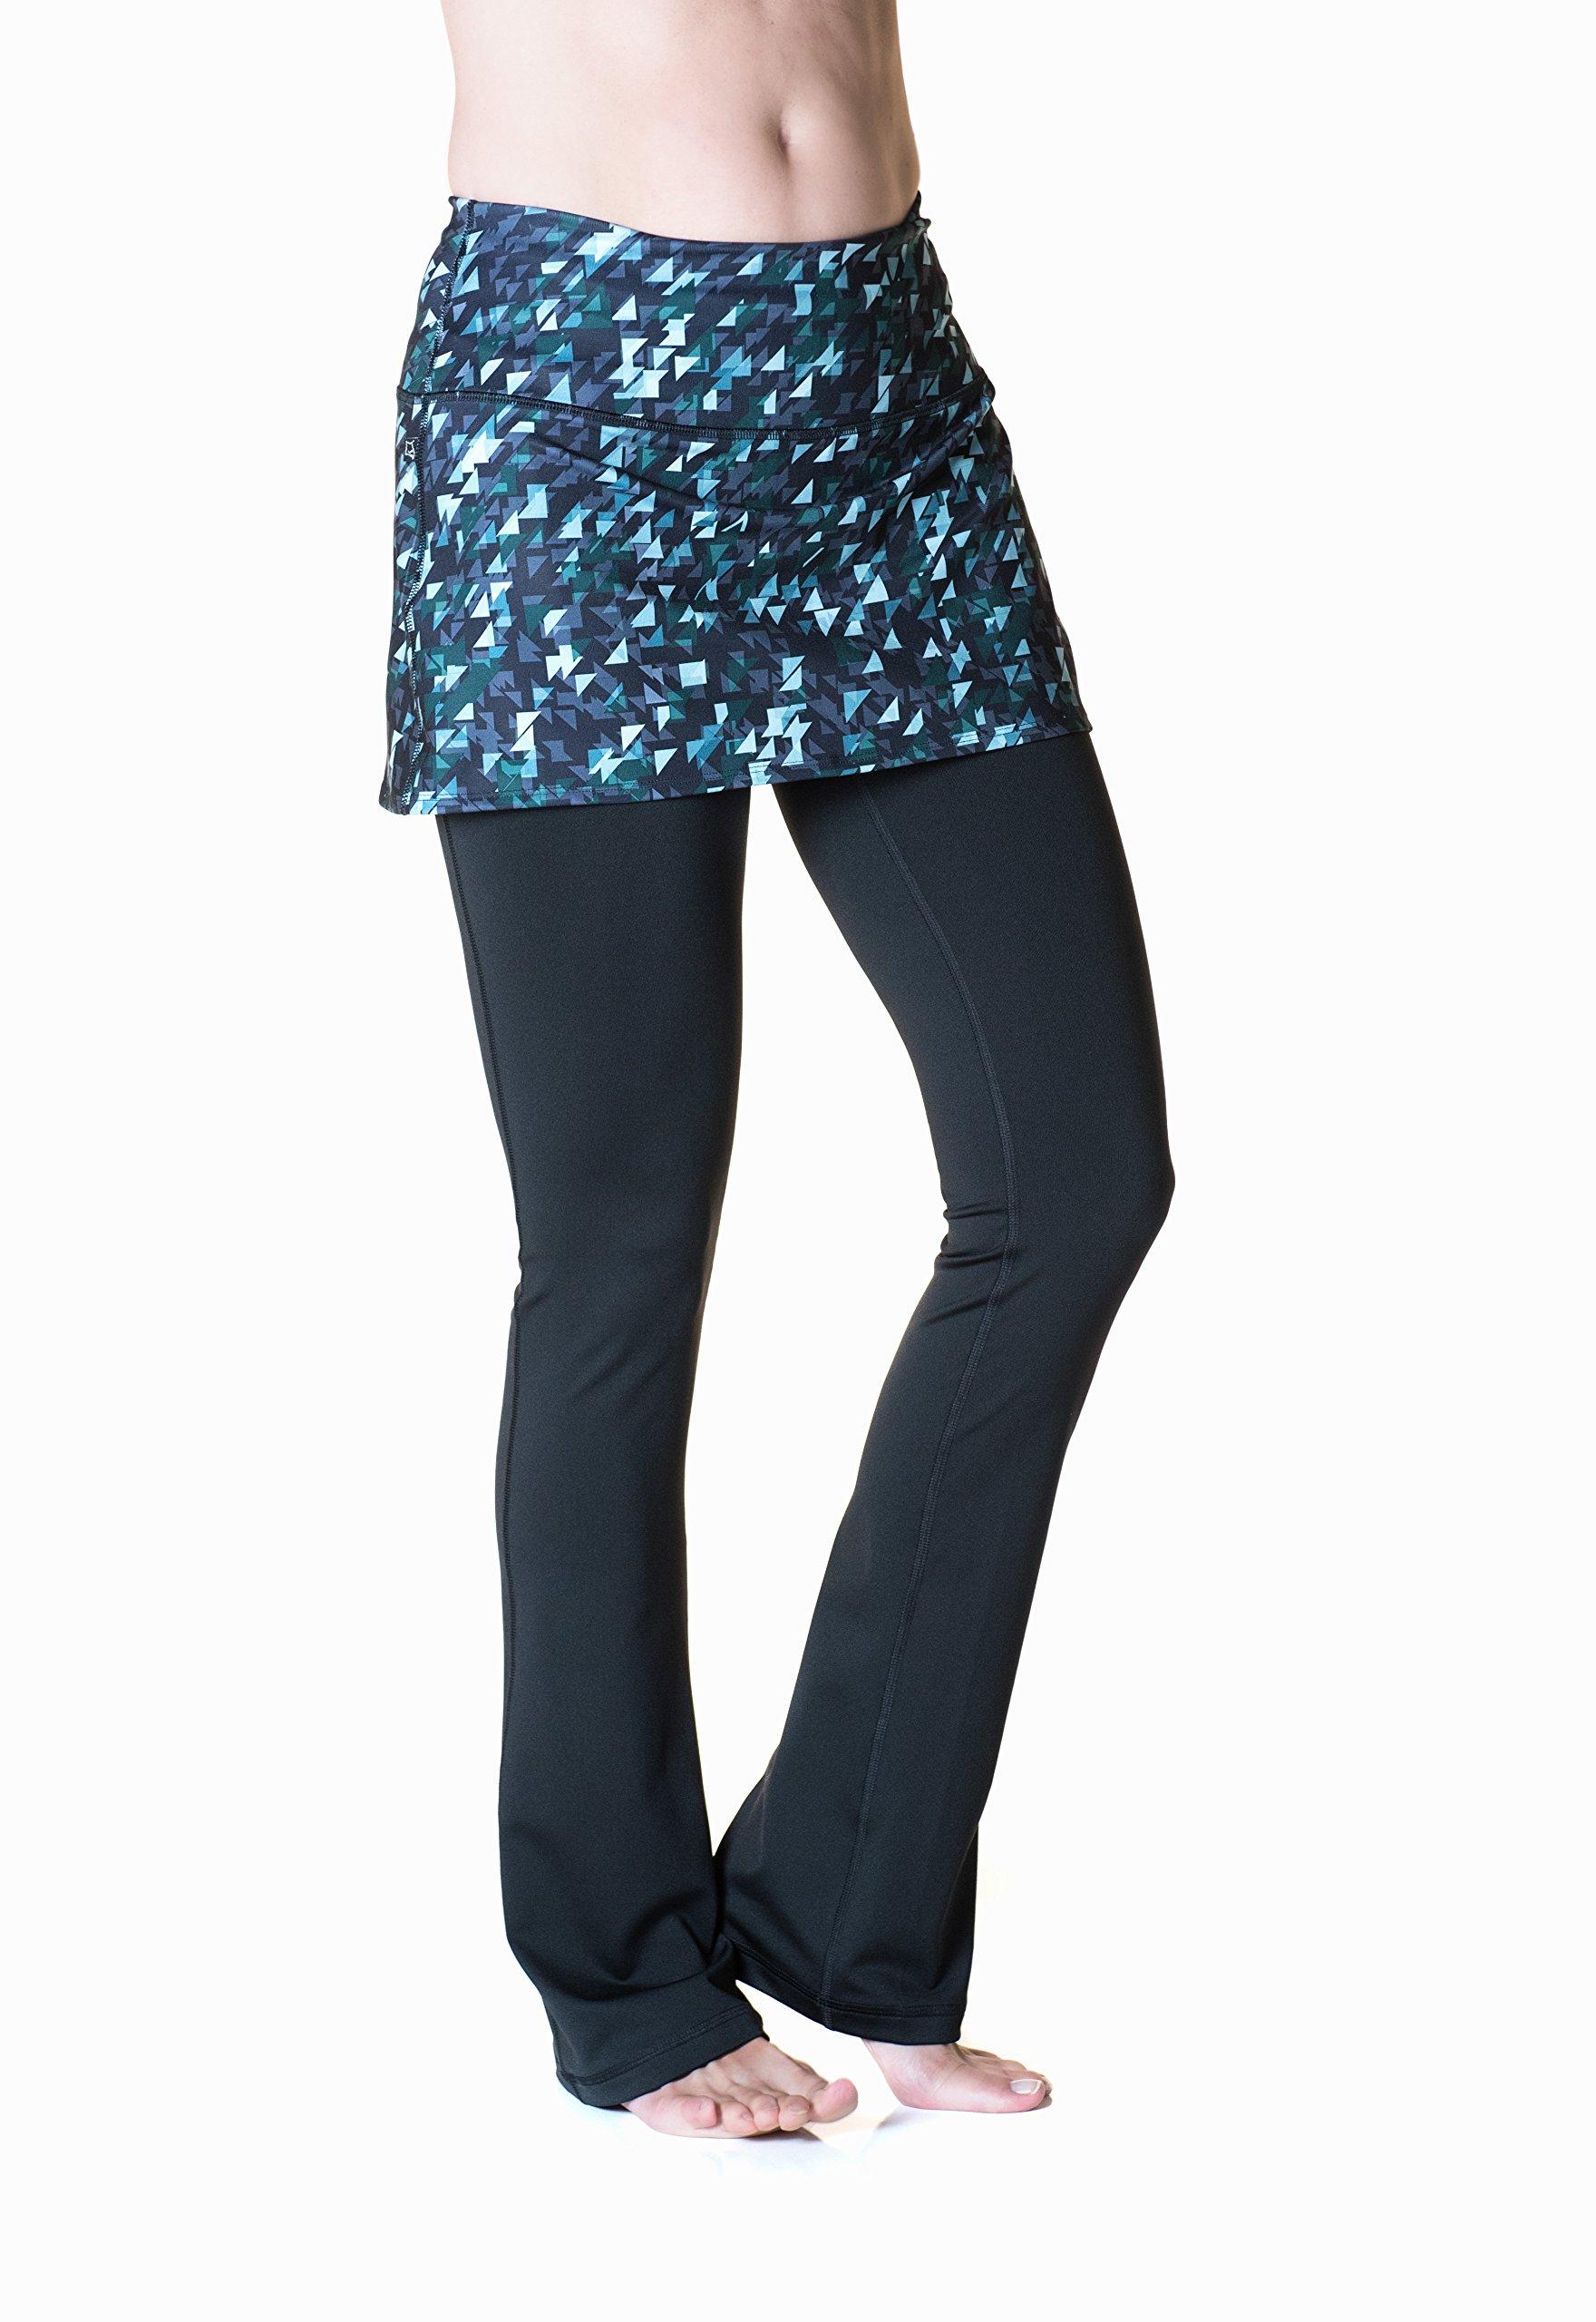 Skirt Sports Women's Tough Girl Skirt, Love Triangle Print/Black, XX-Large